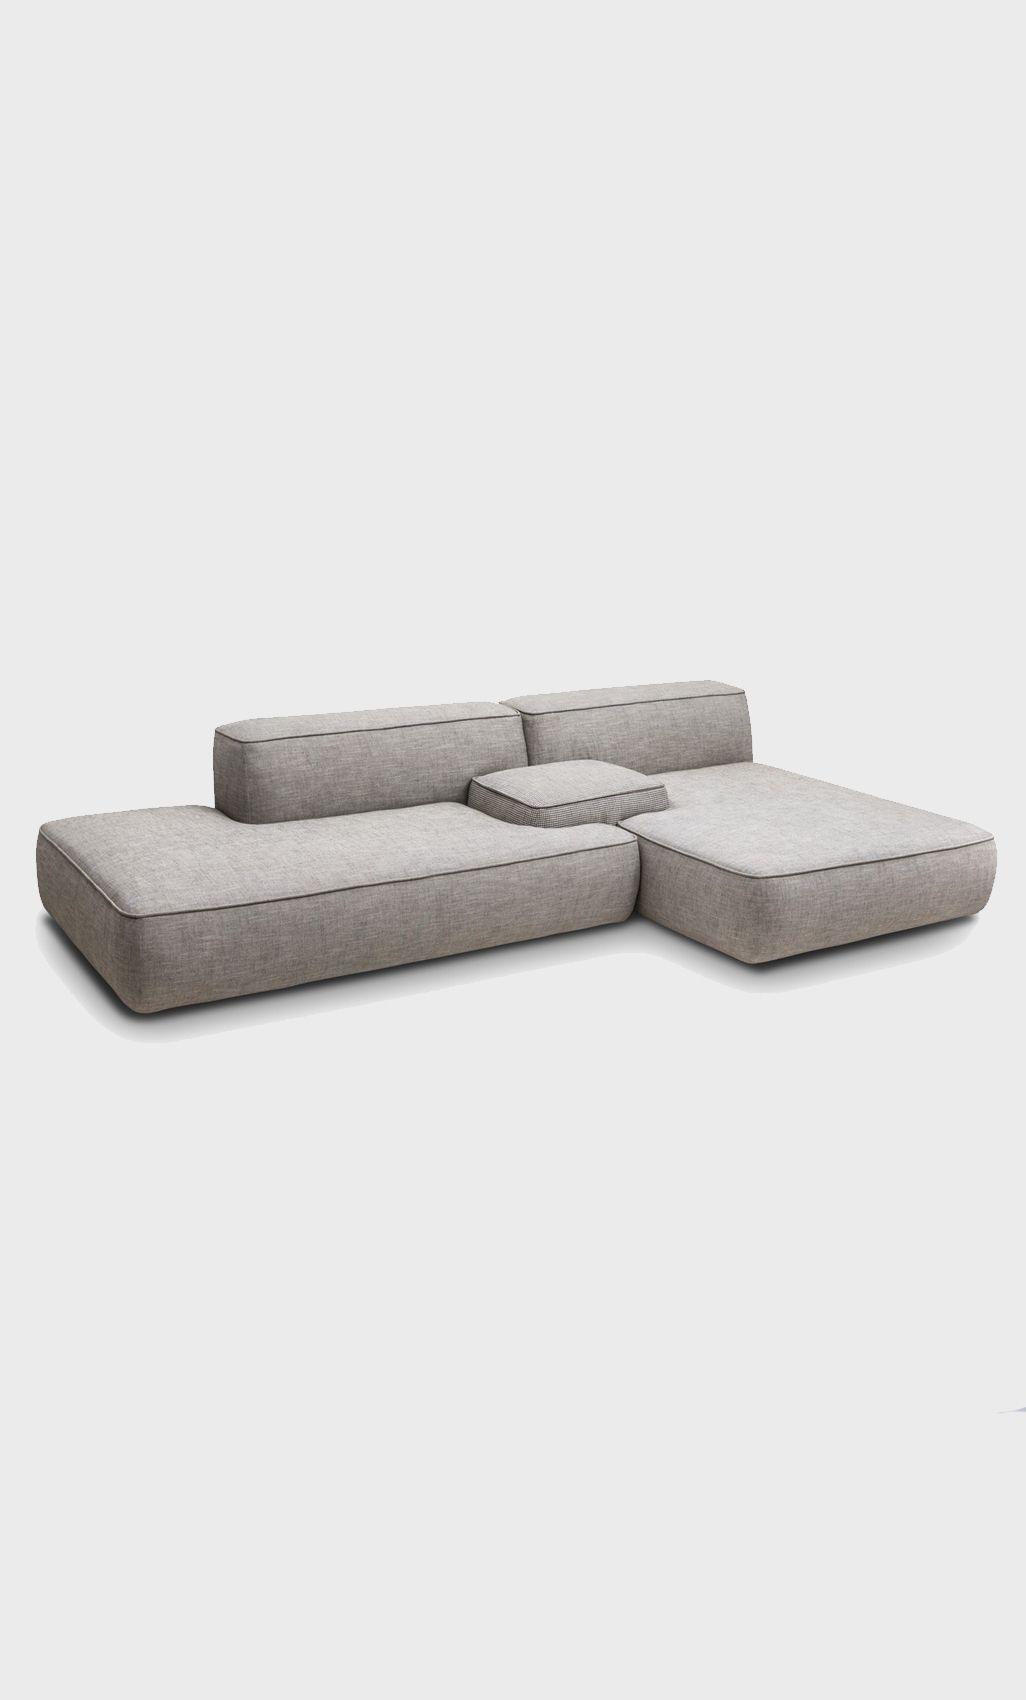 Modular sofa no legs or really small low legs furniture 2 pinterest banken meubels en - Ontwerp banken ...